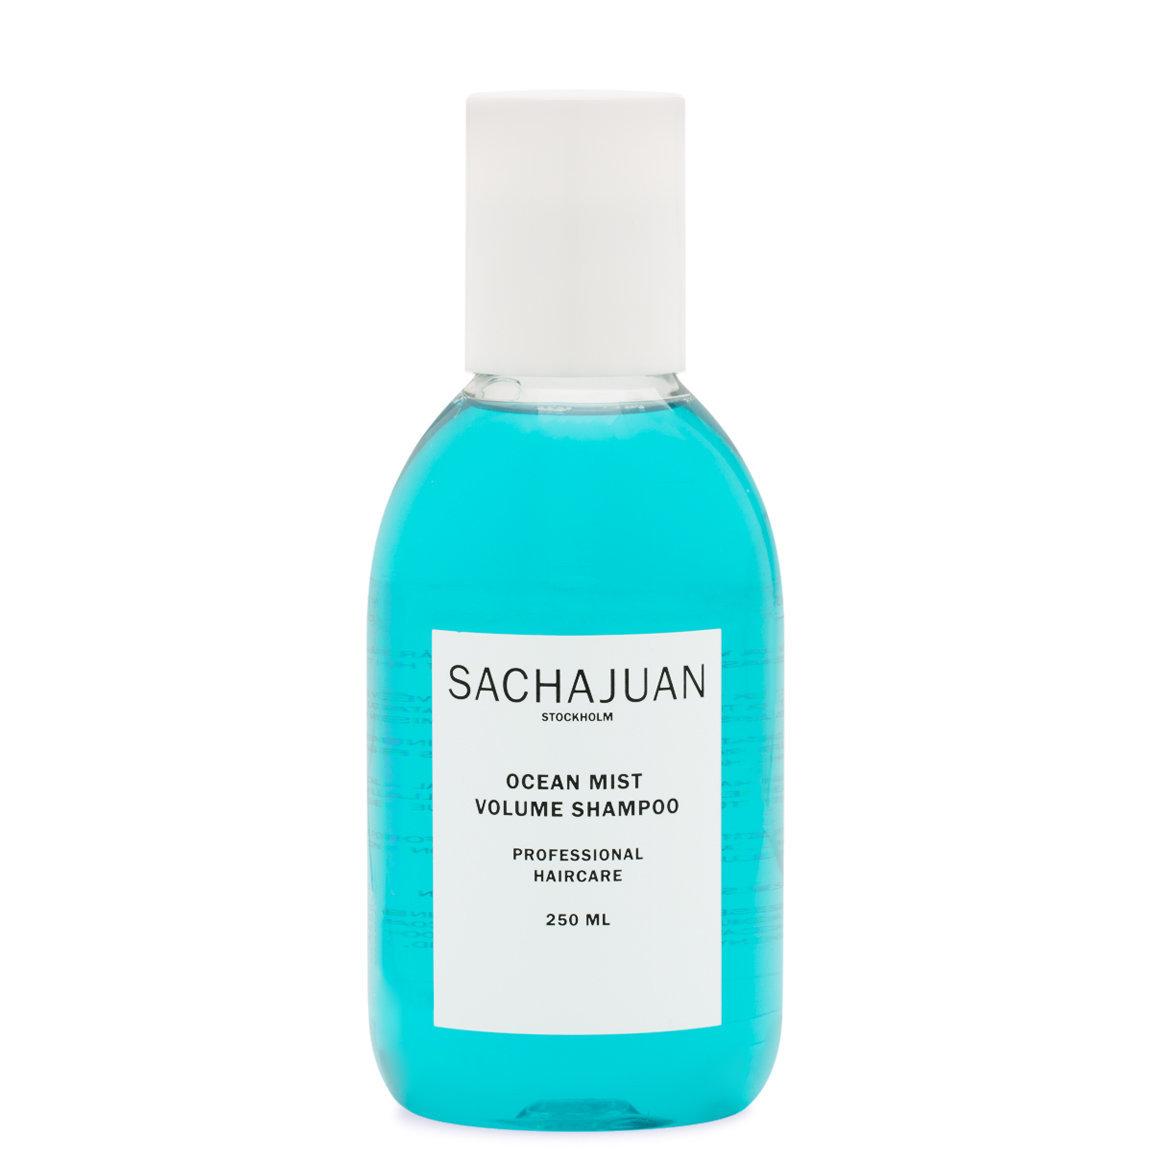 SACHAJUAN Ocean Mist Volume Shampoo alternative view 1 - product swatch.